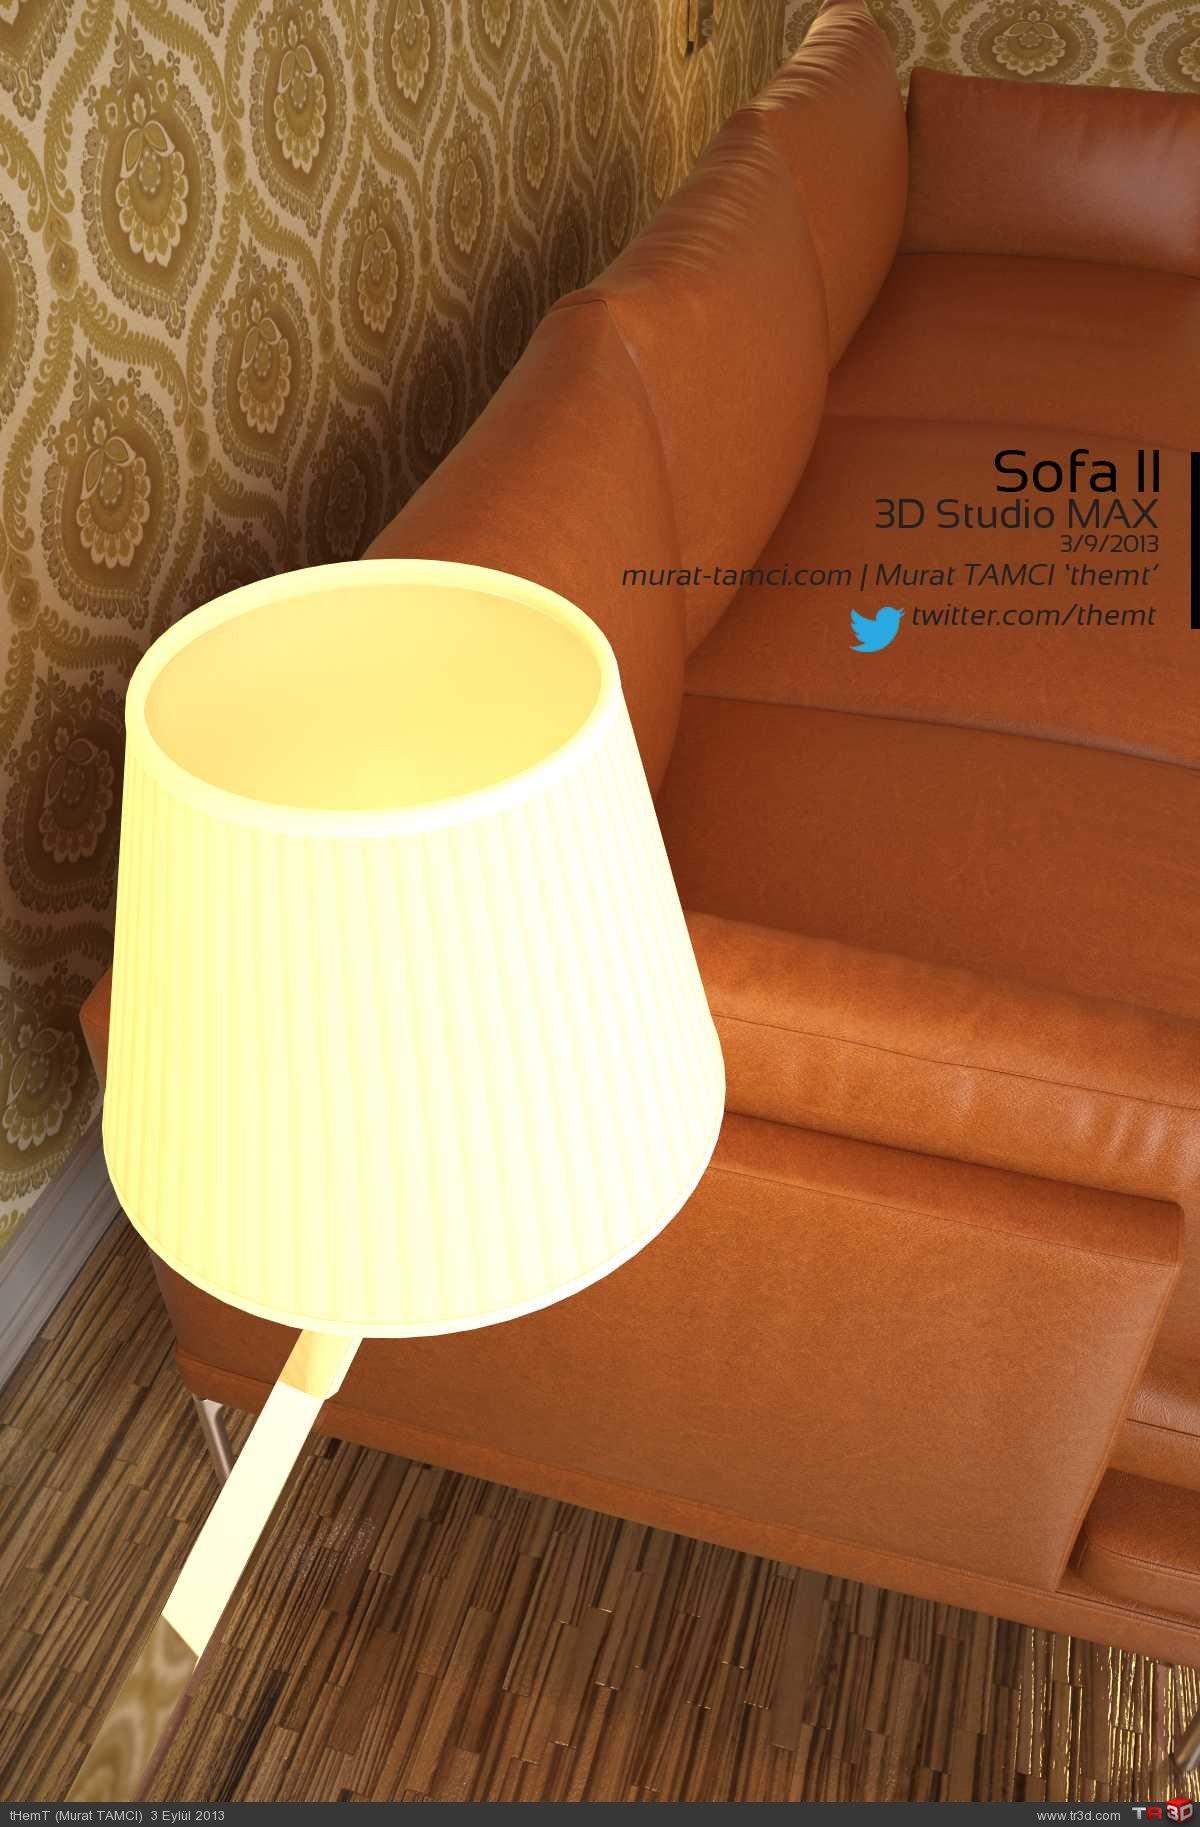 Sofa II 4